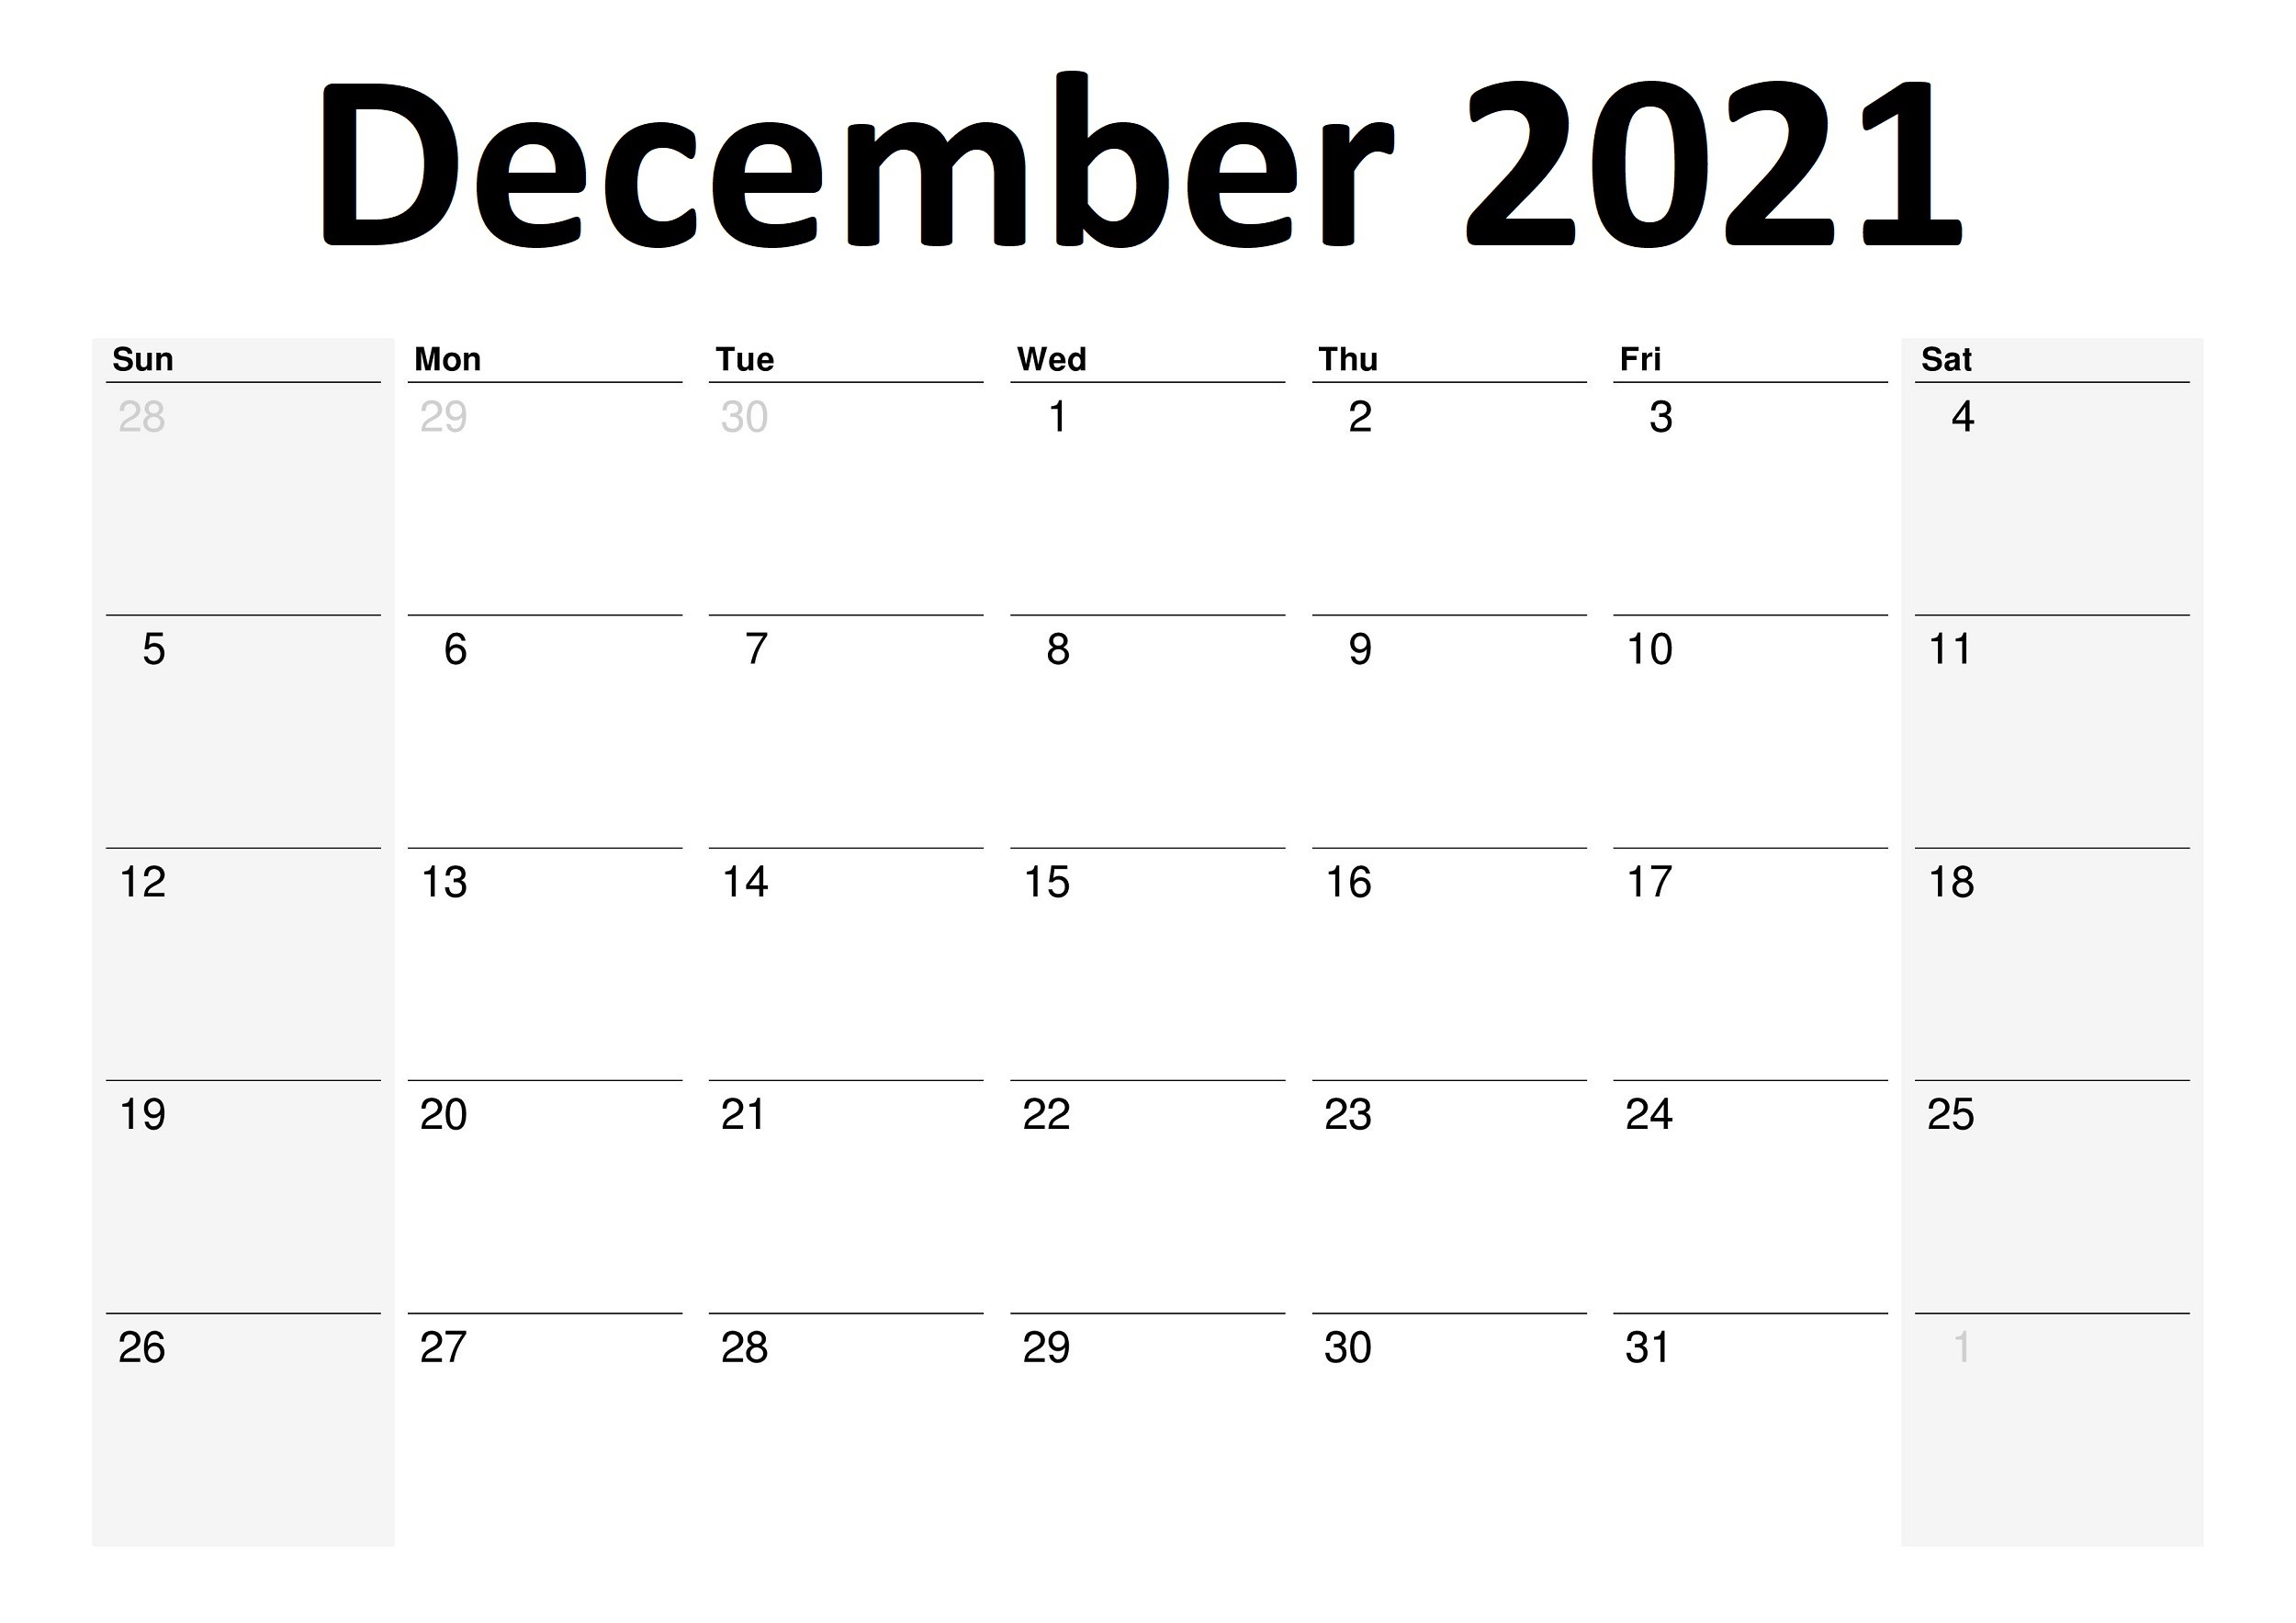 December 2021 Printable Calendar Date Range